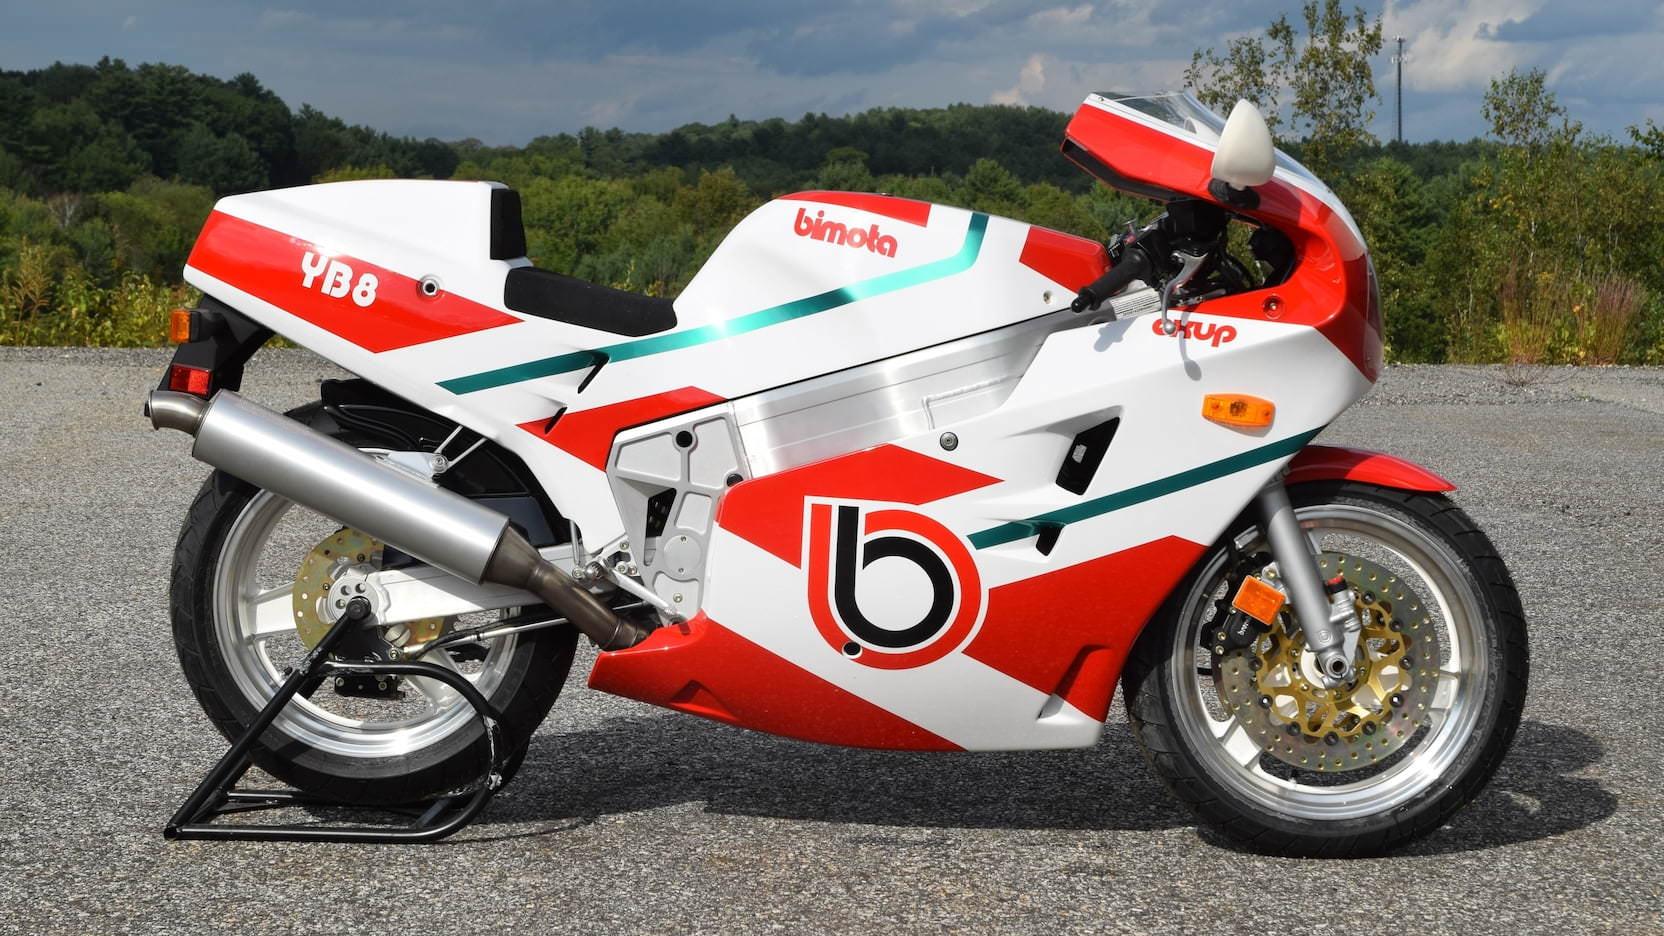 Bimota YB8